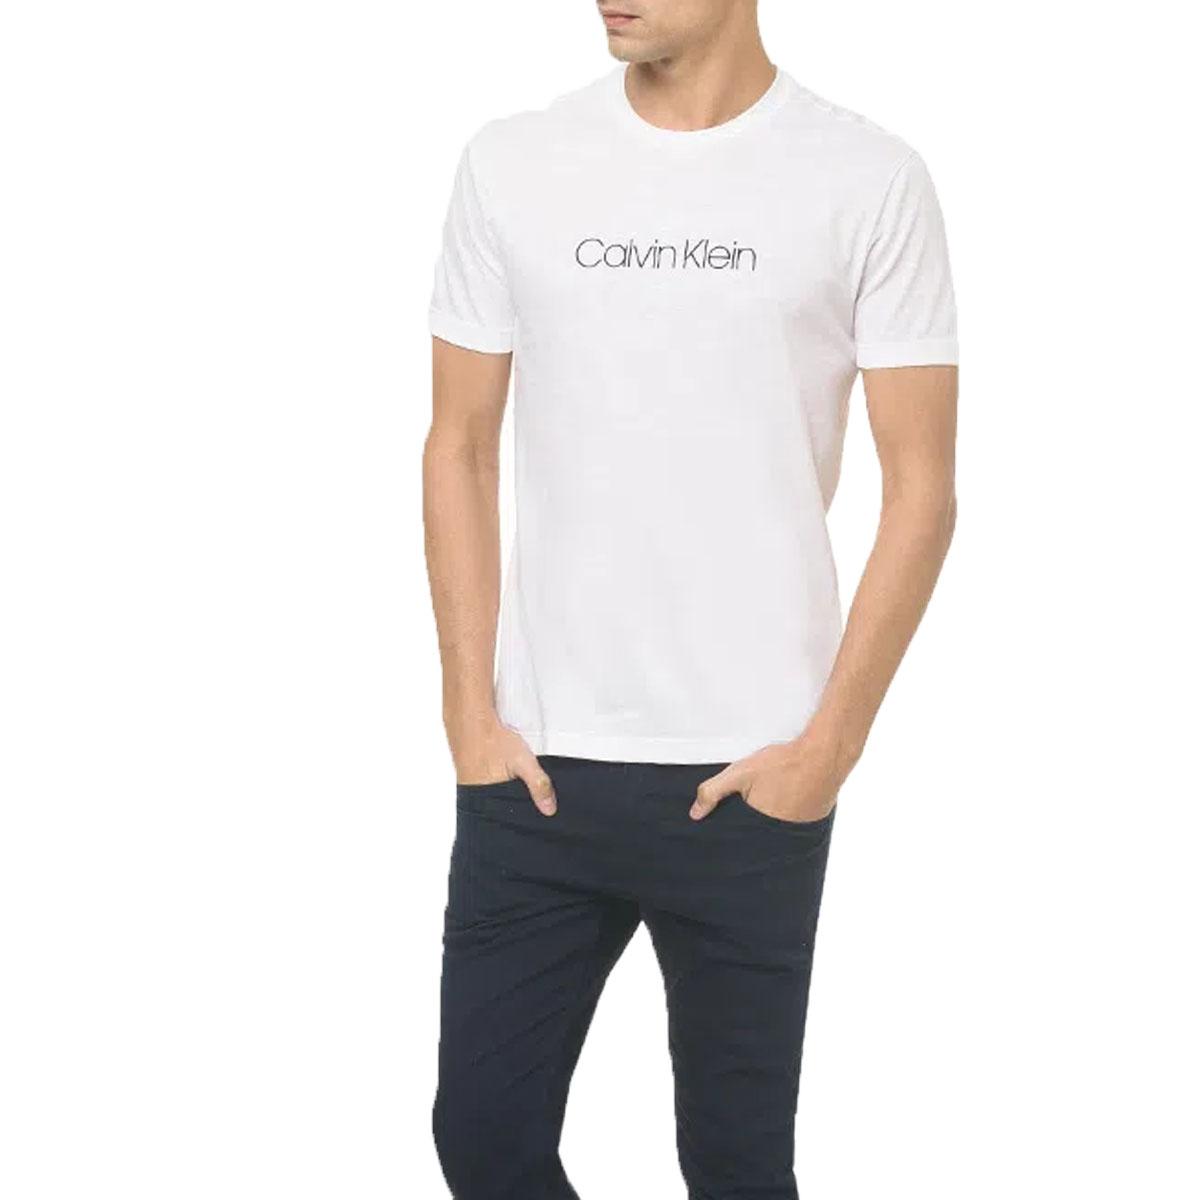 Camiseta Calvin Klein Masculina Flame Branco Ck Peito